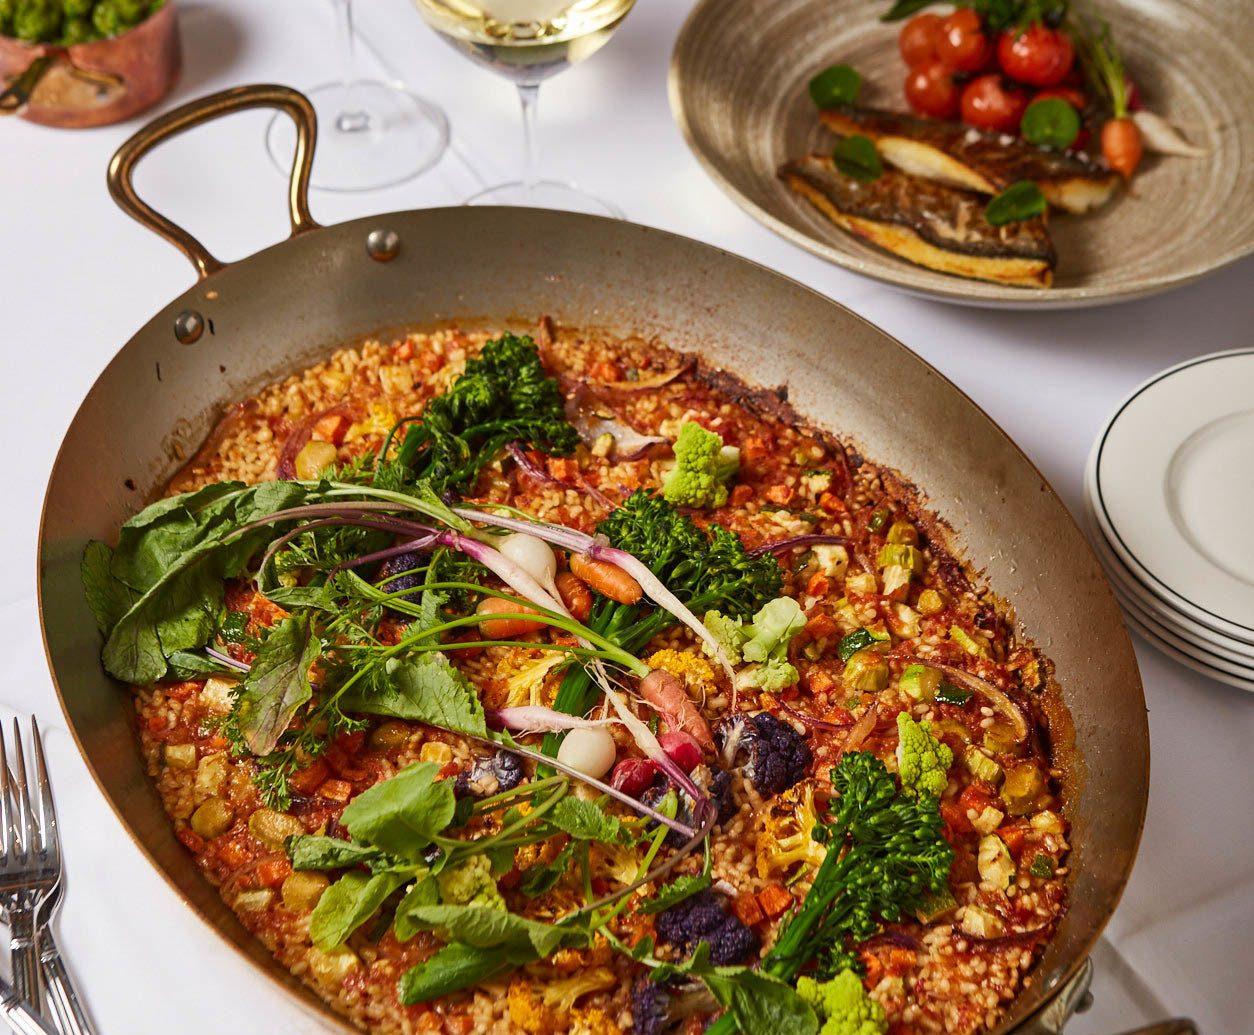 Trip Ideas food plate table dish cuisine vegetable paella meal european food produce italian food different several fresh